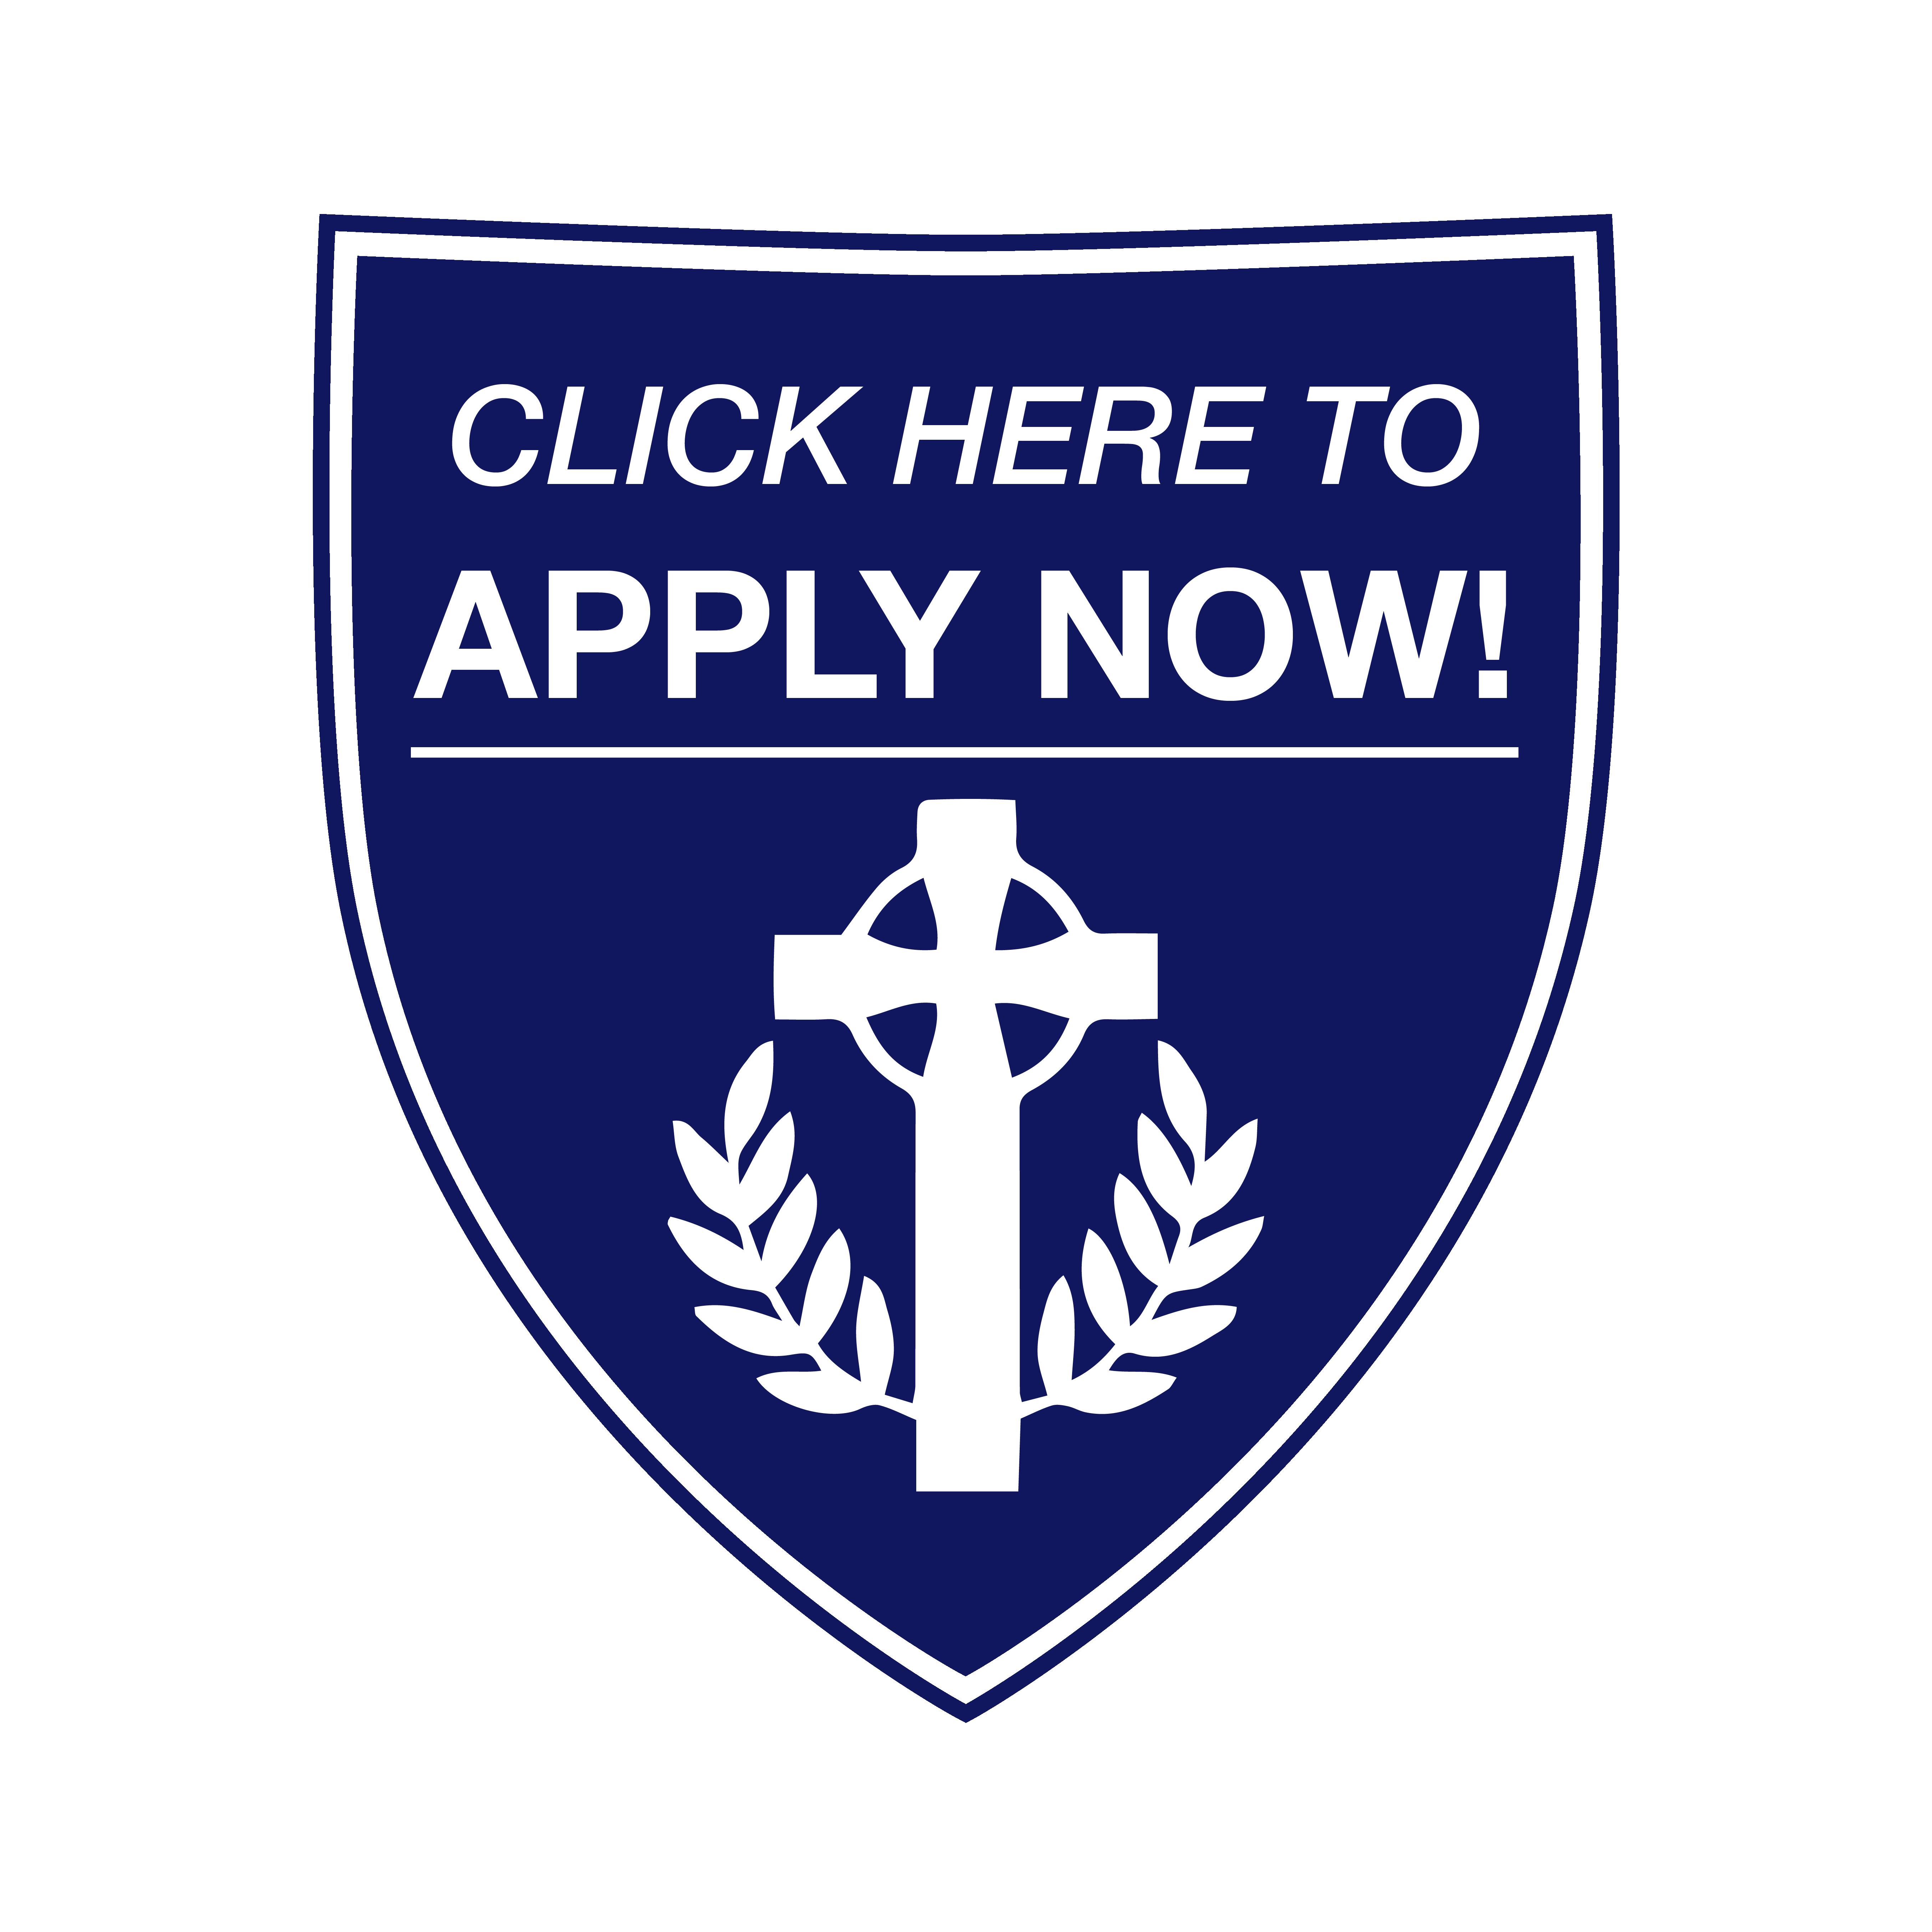 Southlake Christian Academy Christian Jk 12 School